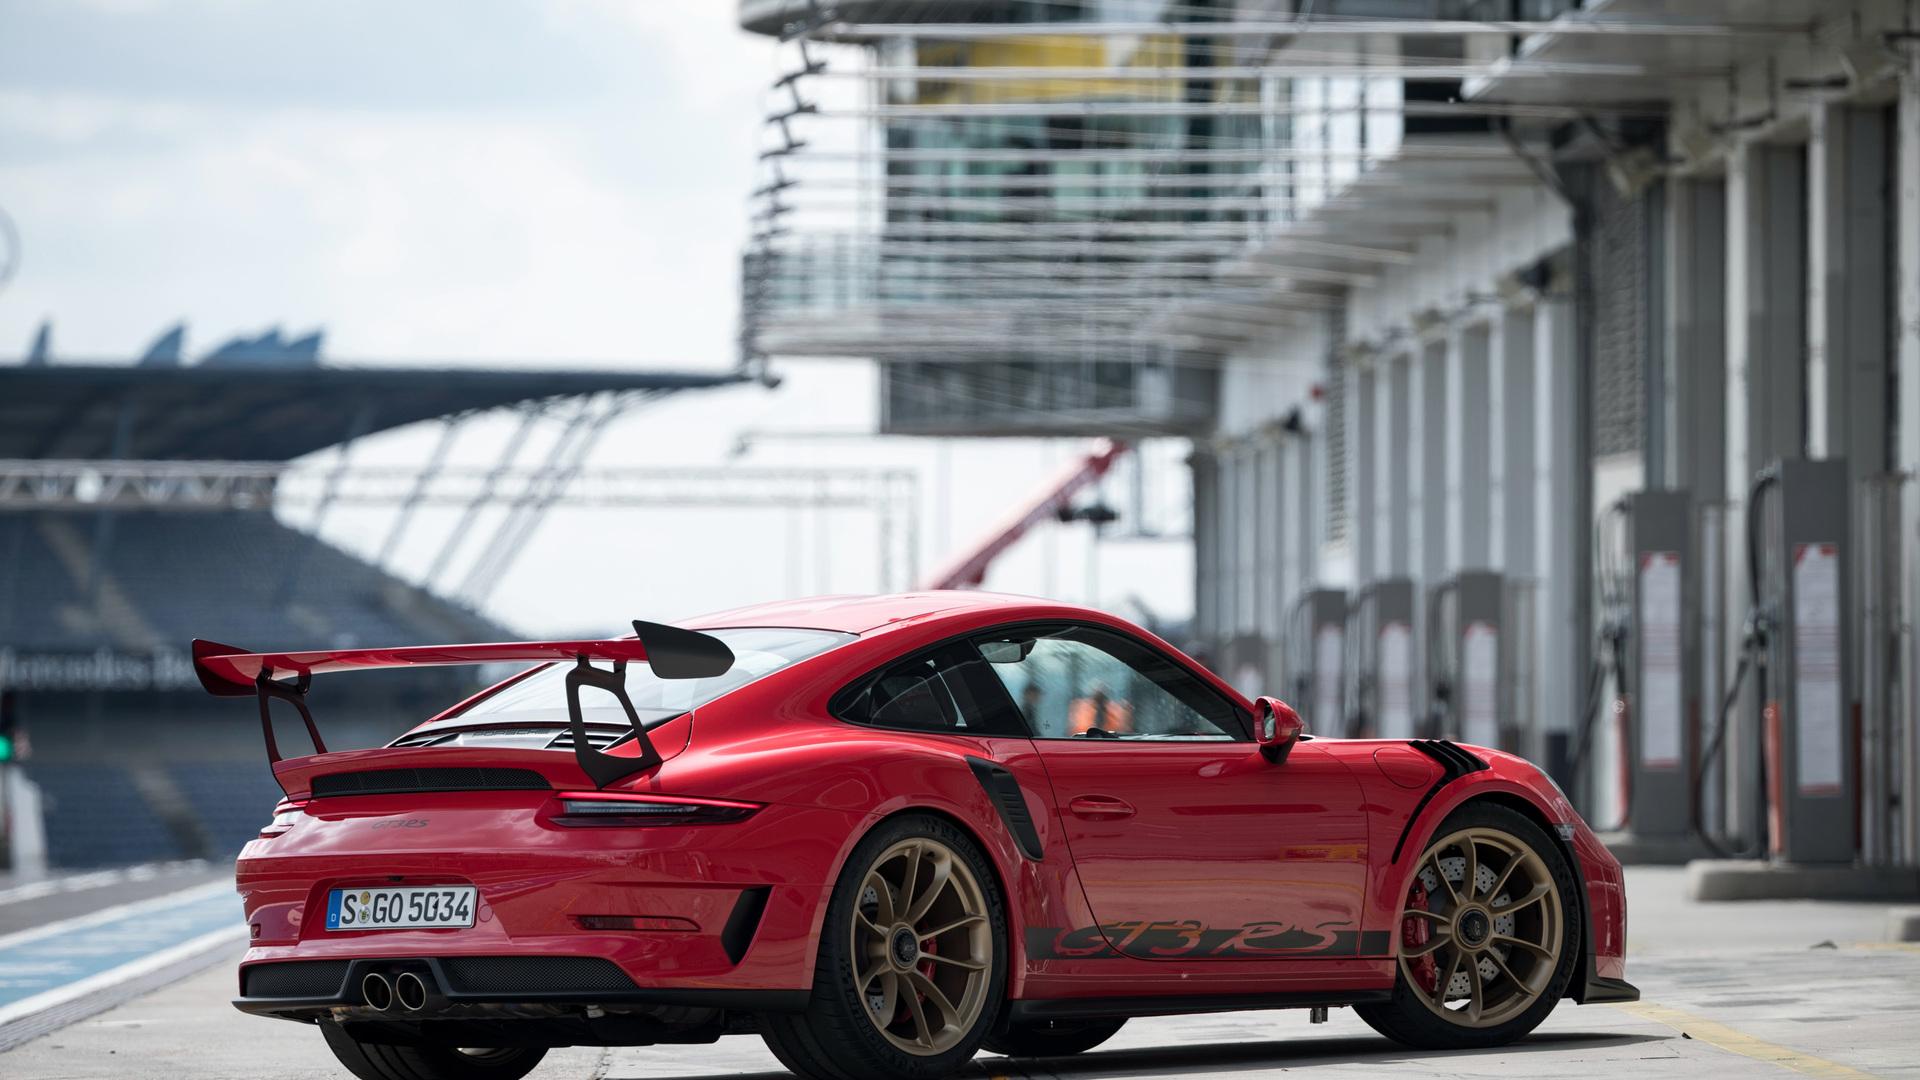 1920x1080 Porsche 911 GT3 RS 4k Laptop Full HD 1080P HD 4k